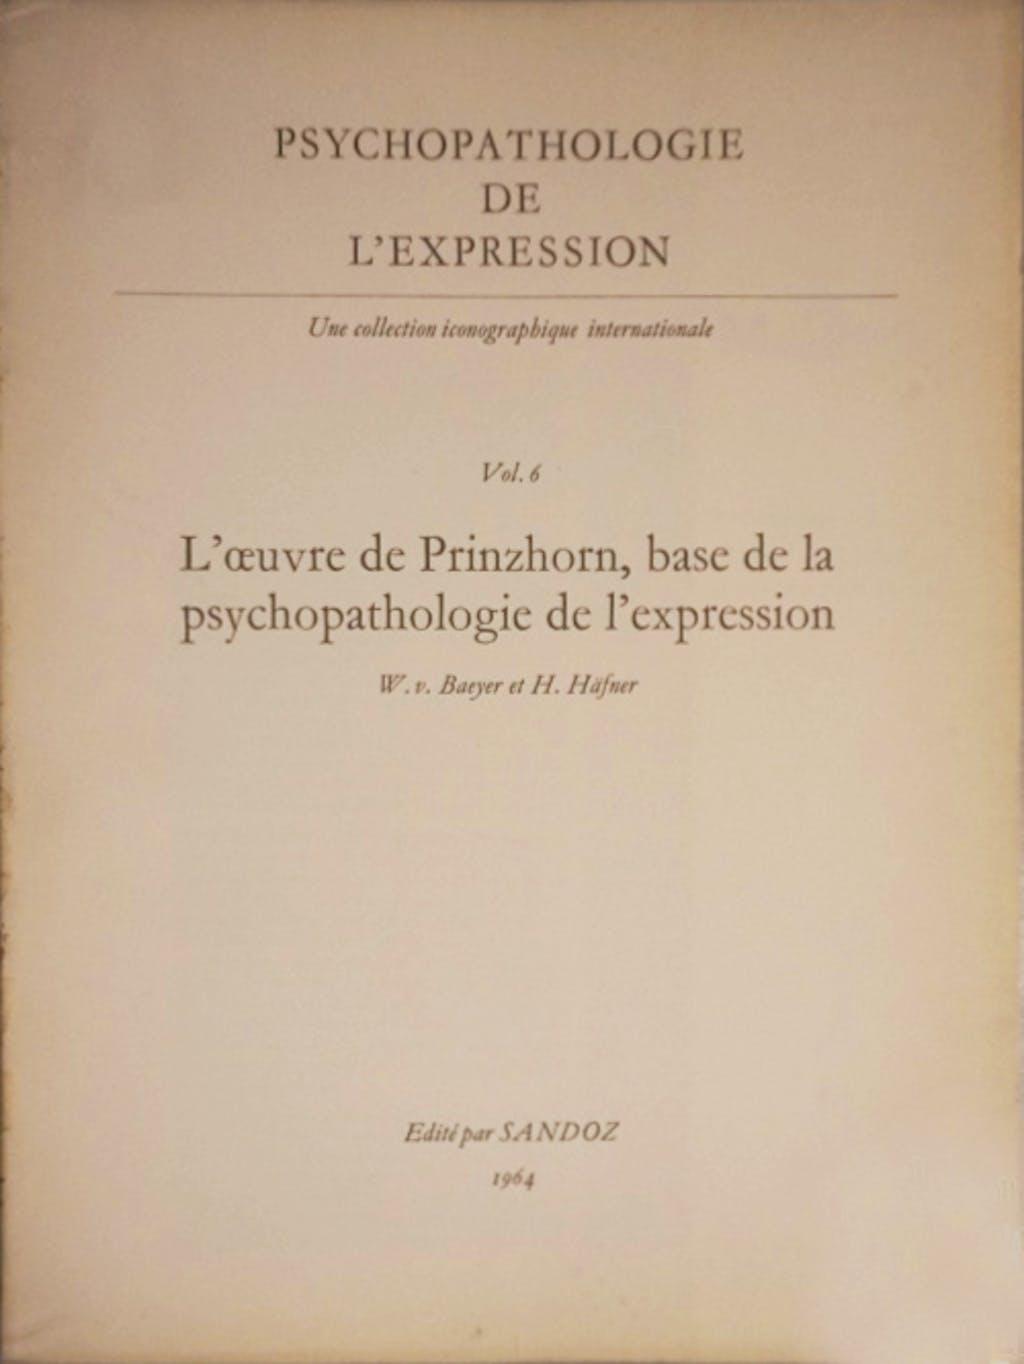 Psychopathologie de l'expression n°6 - © christian berst — art brut